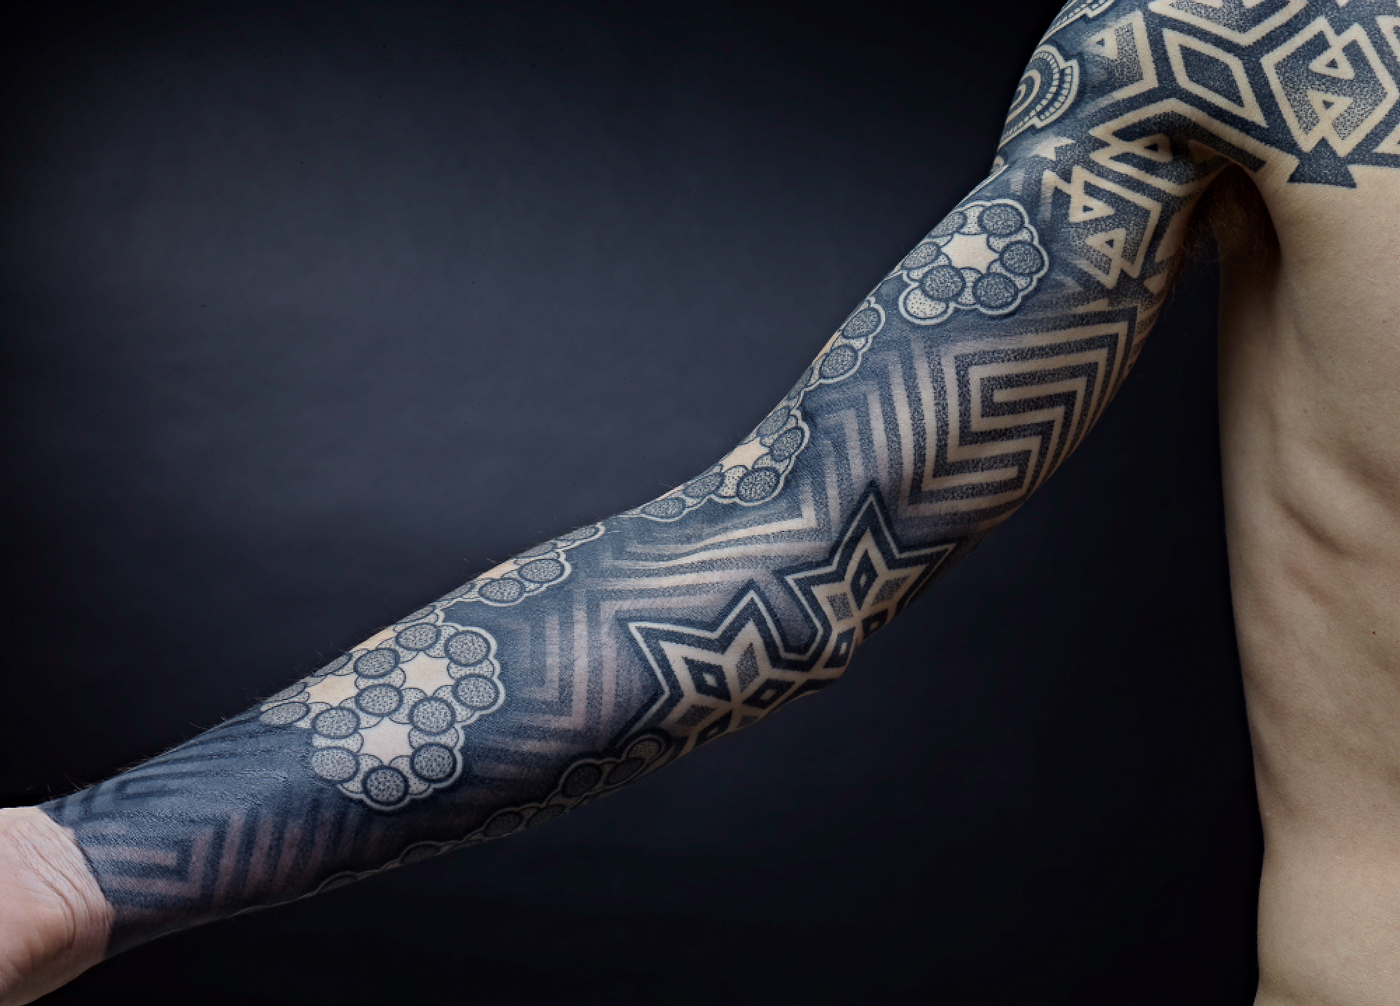 tattoofriday 40 tatuagens geom tricas. Black Bedroom Furniture Sets. Home Design Ideas